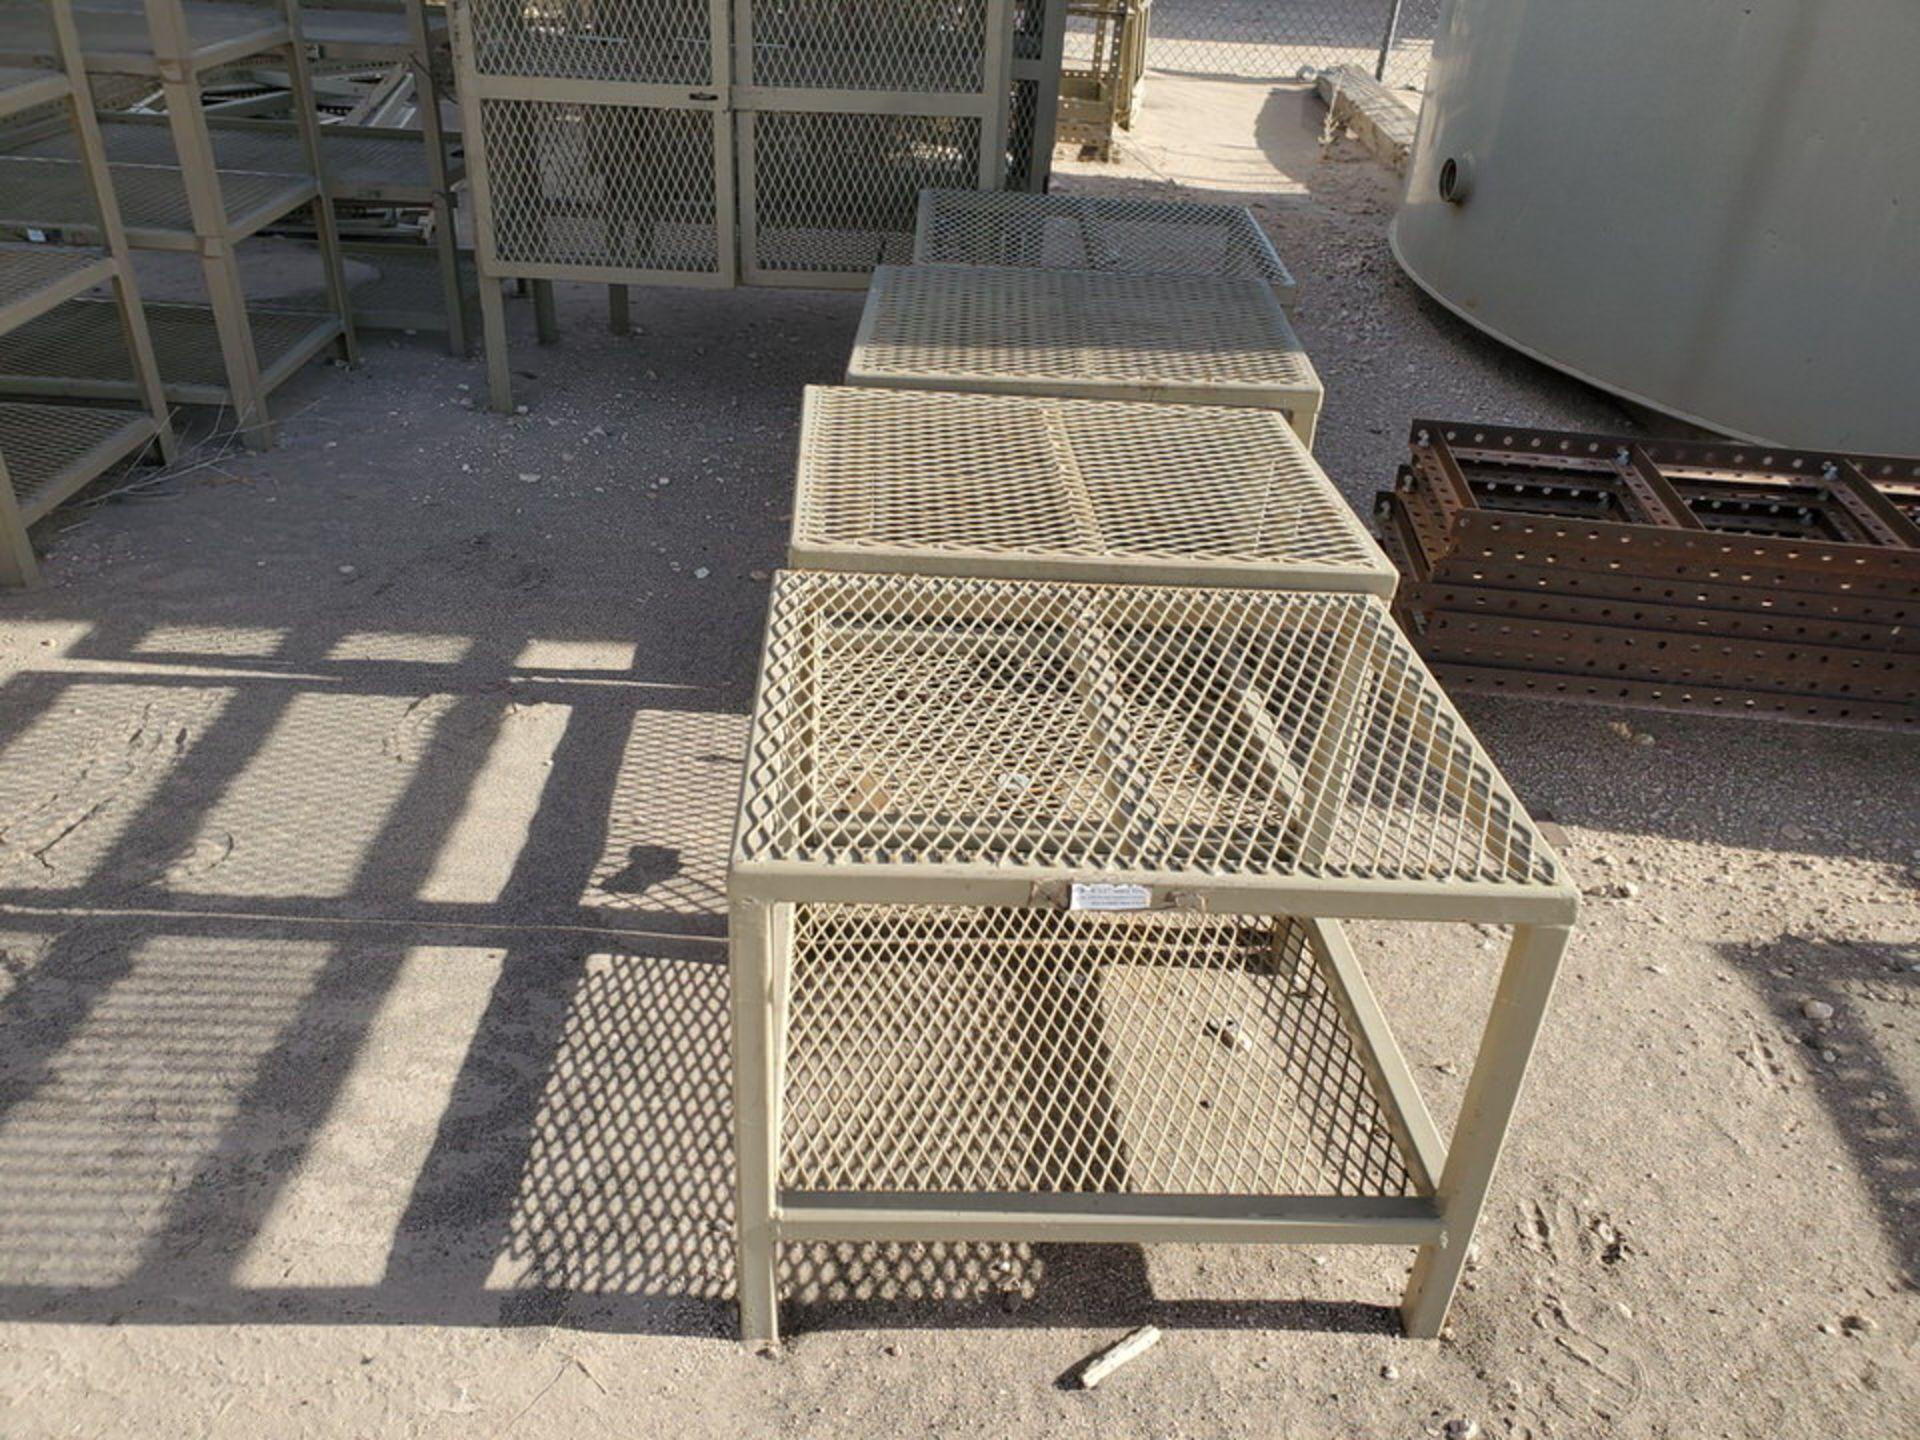 "Assorted Stl Matl. Racks & Ladders Size Range: 30"" x 26"" x 25""H - 29"" x 48"" x 50""H - Image 4 of 18"